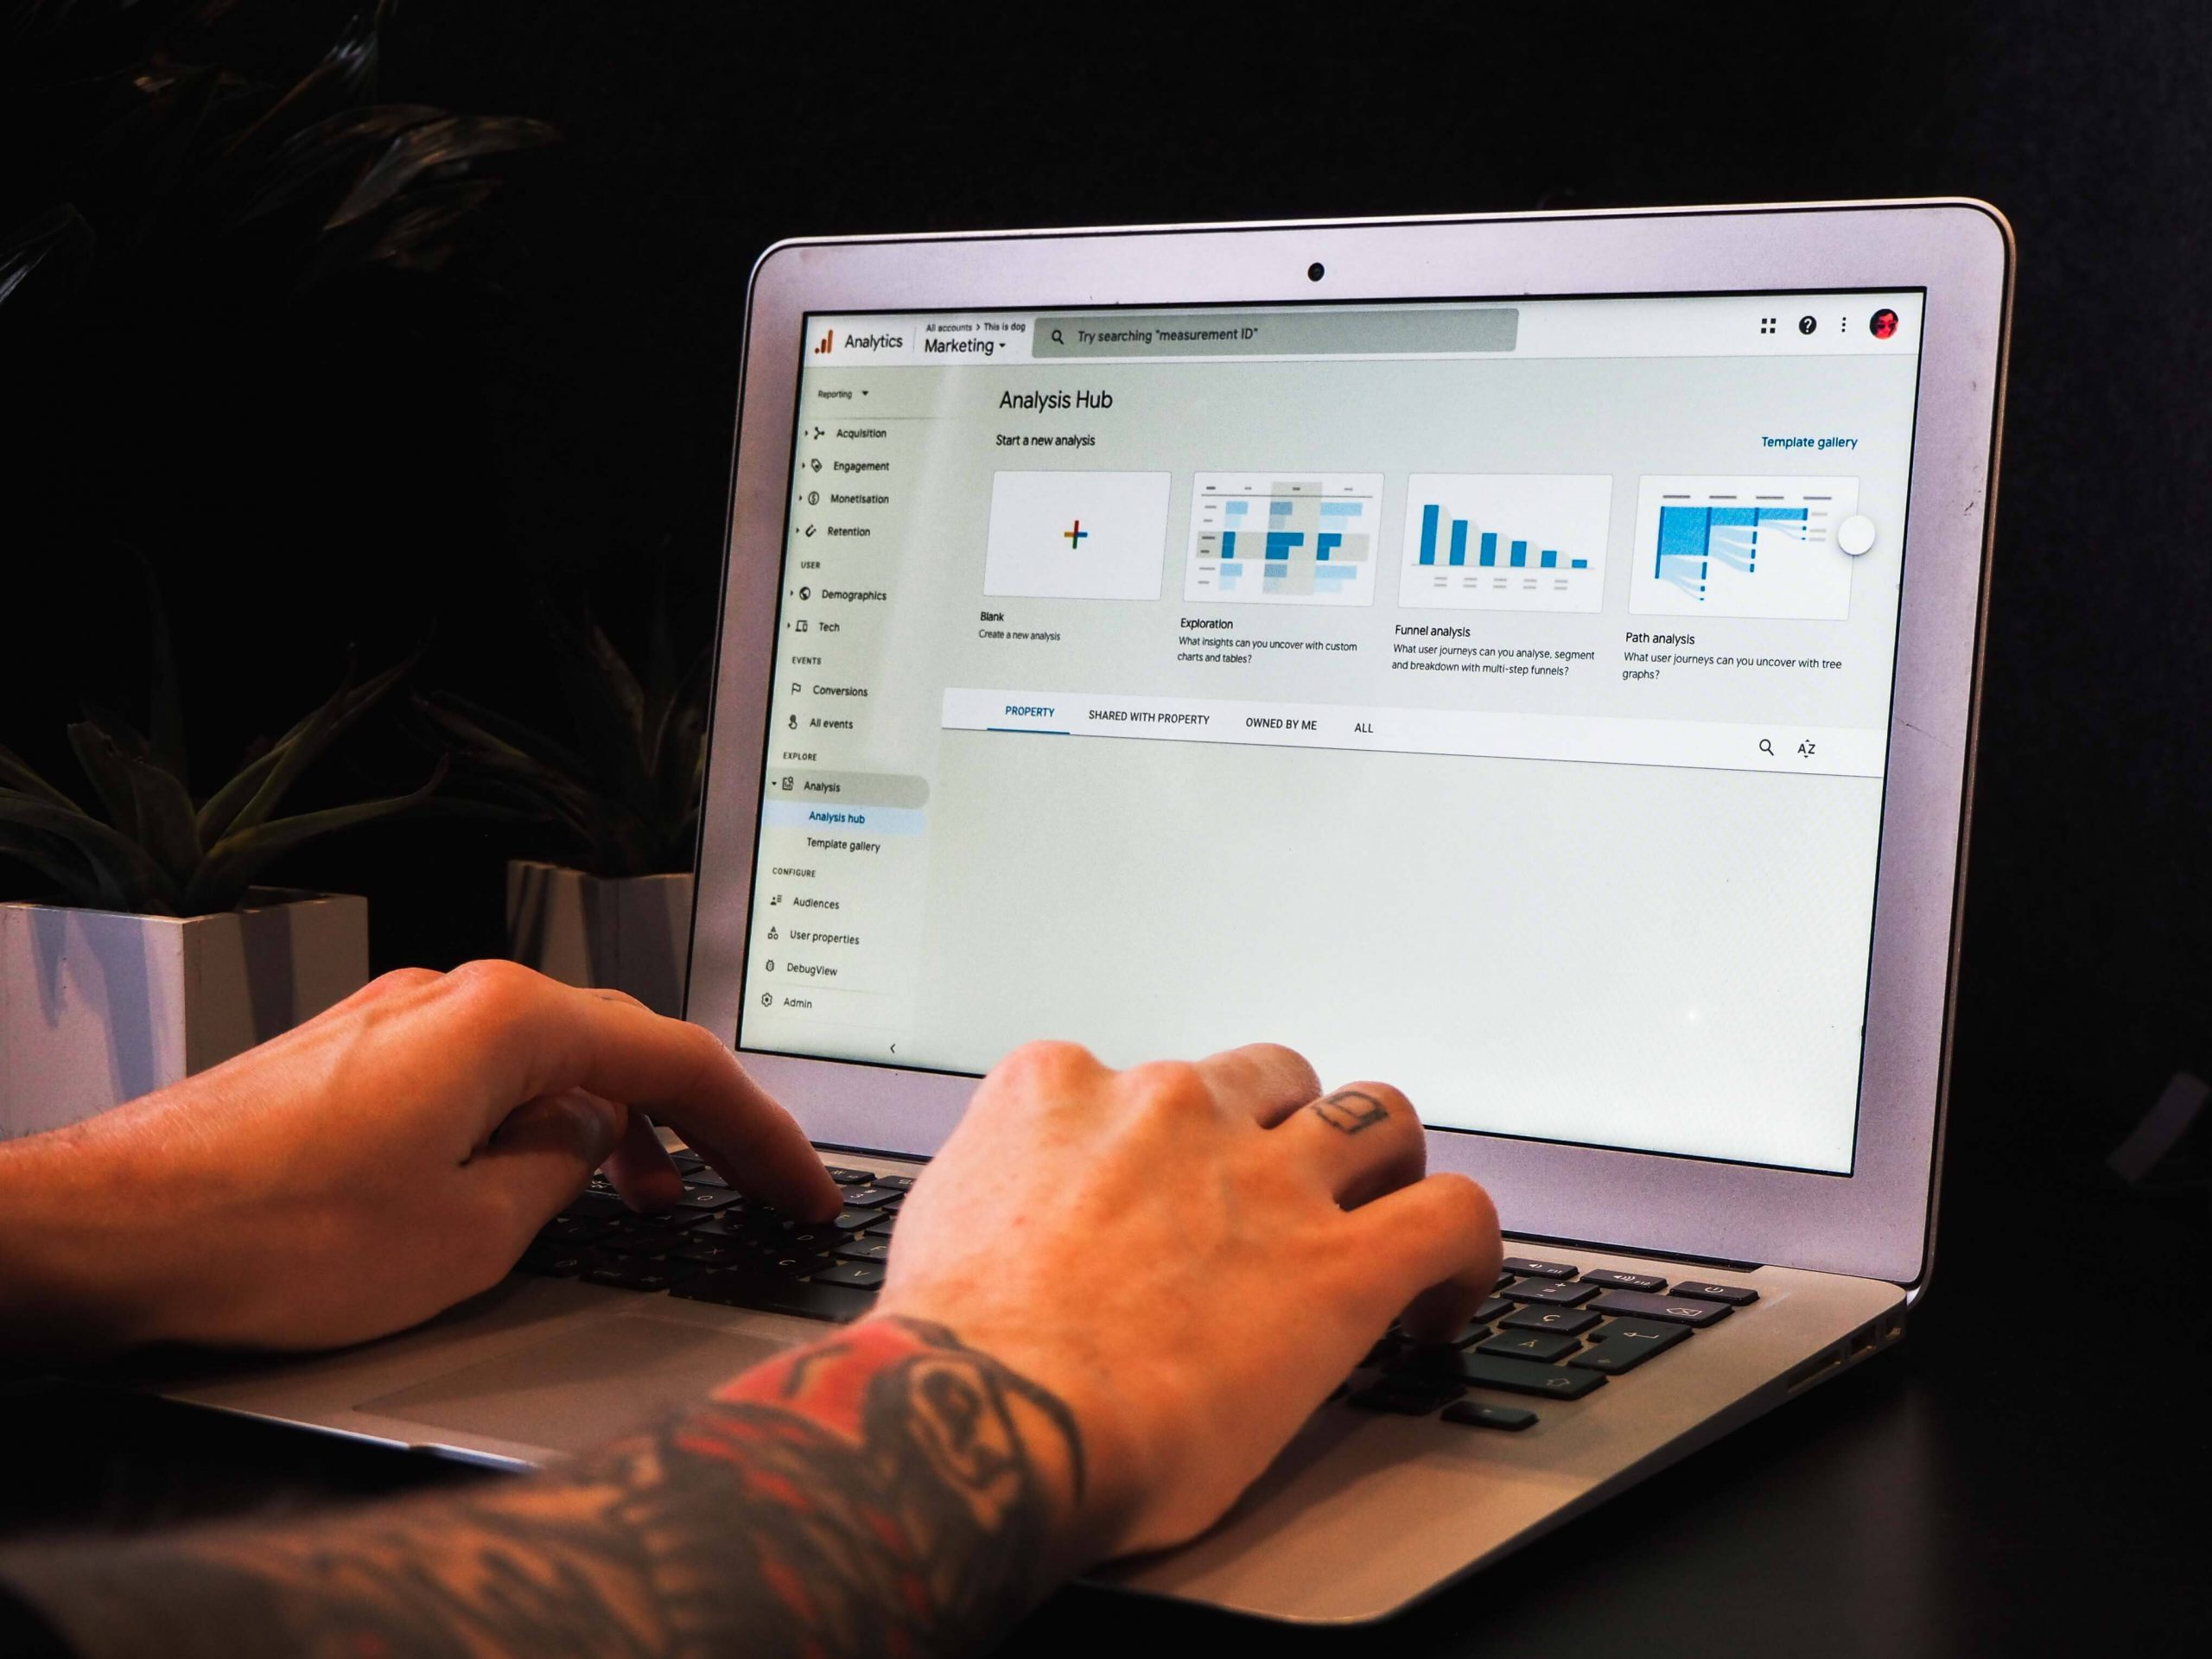 asesoria data anlytics empresas